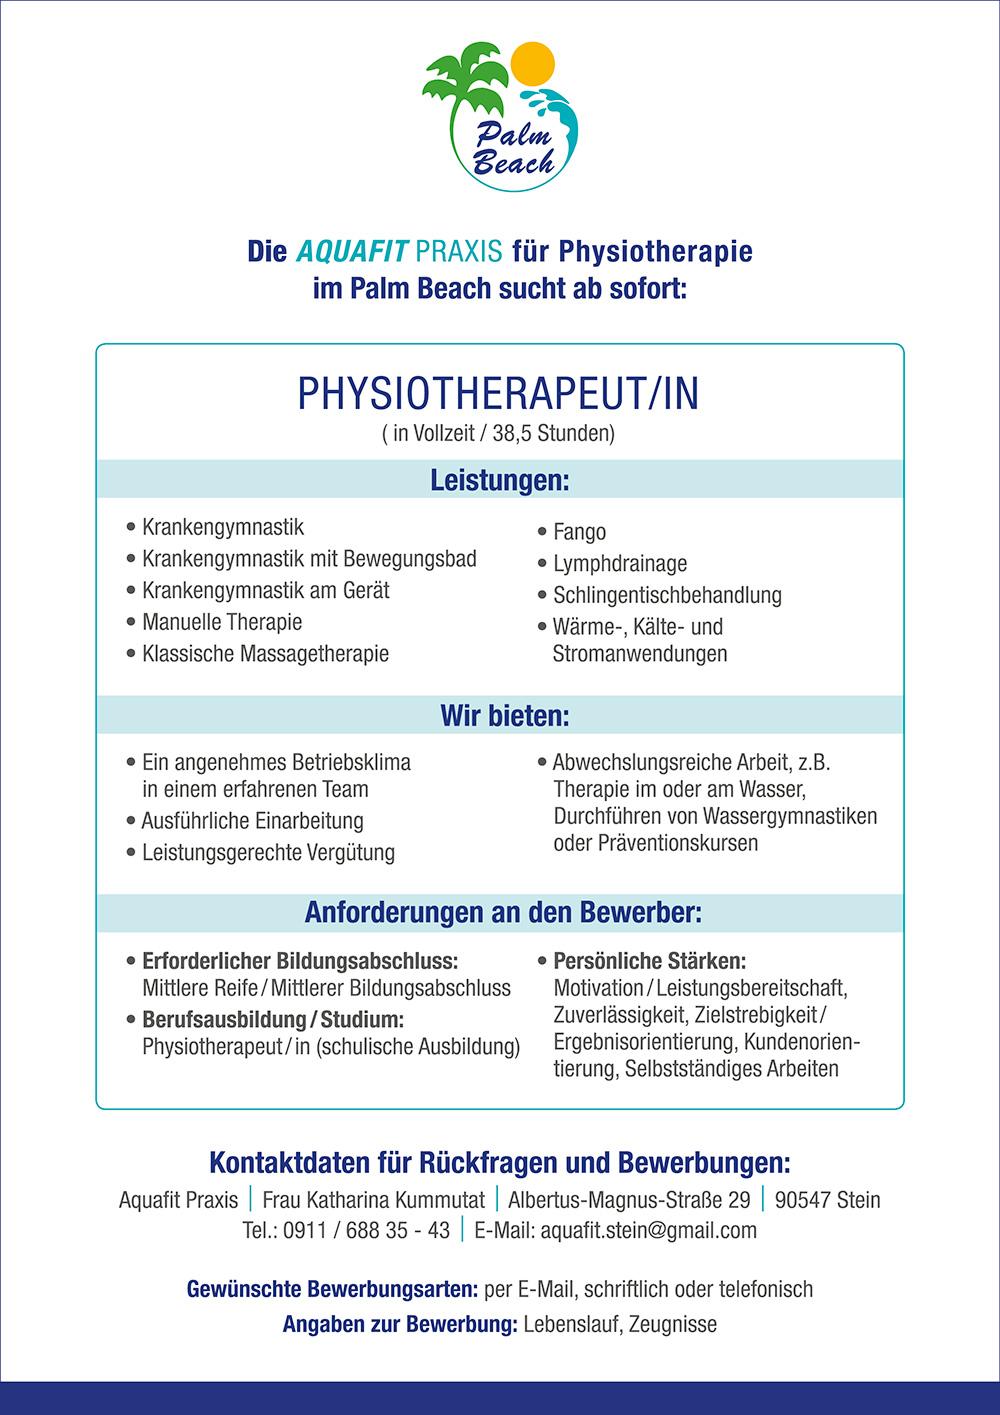 PalmBeach Stellenanzeige Physiotherapeut/in